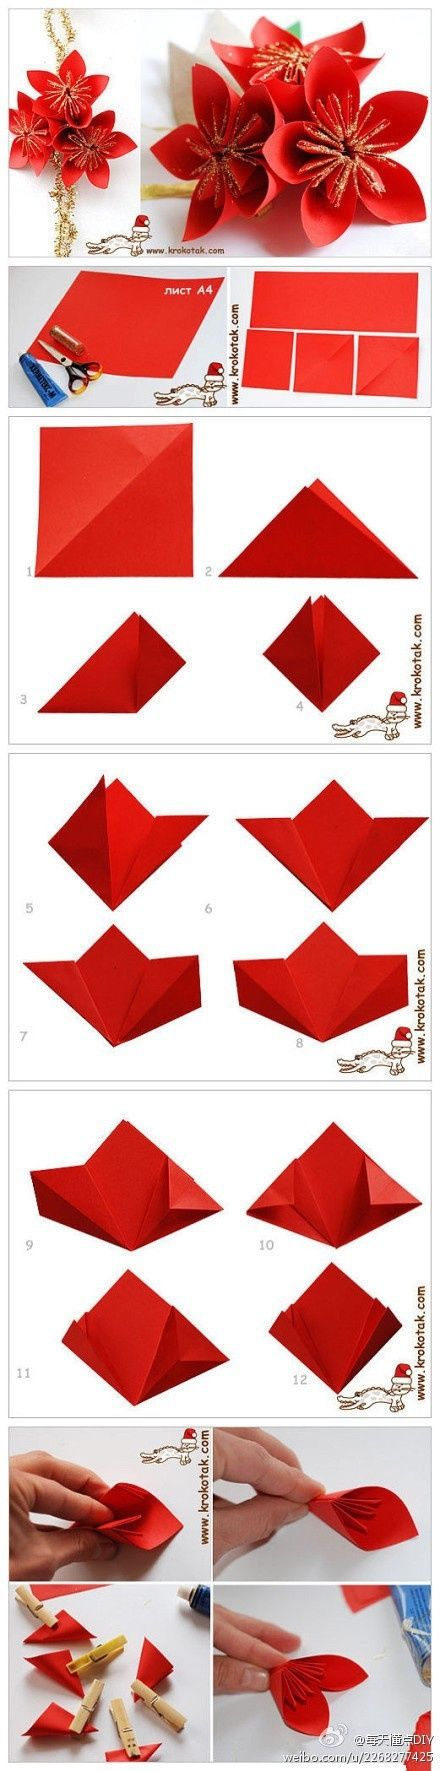 how to make origsmi for christmas